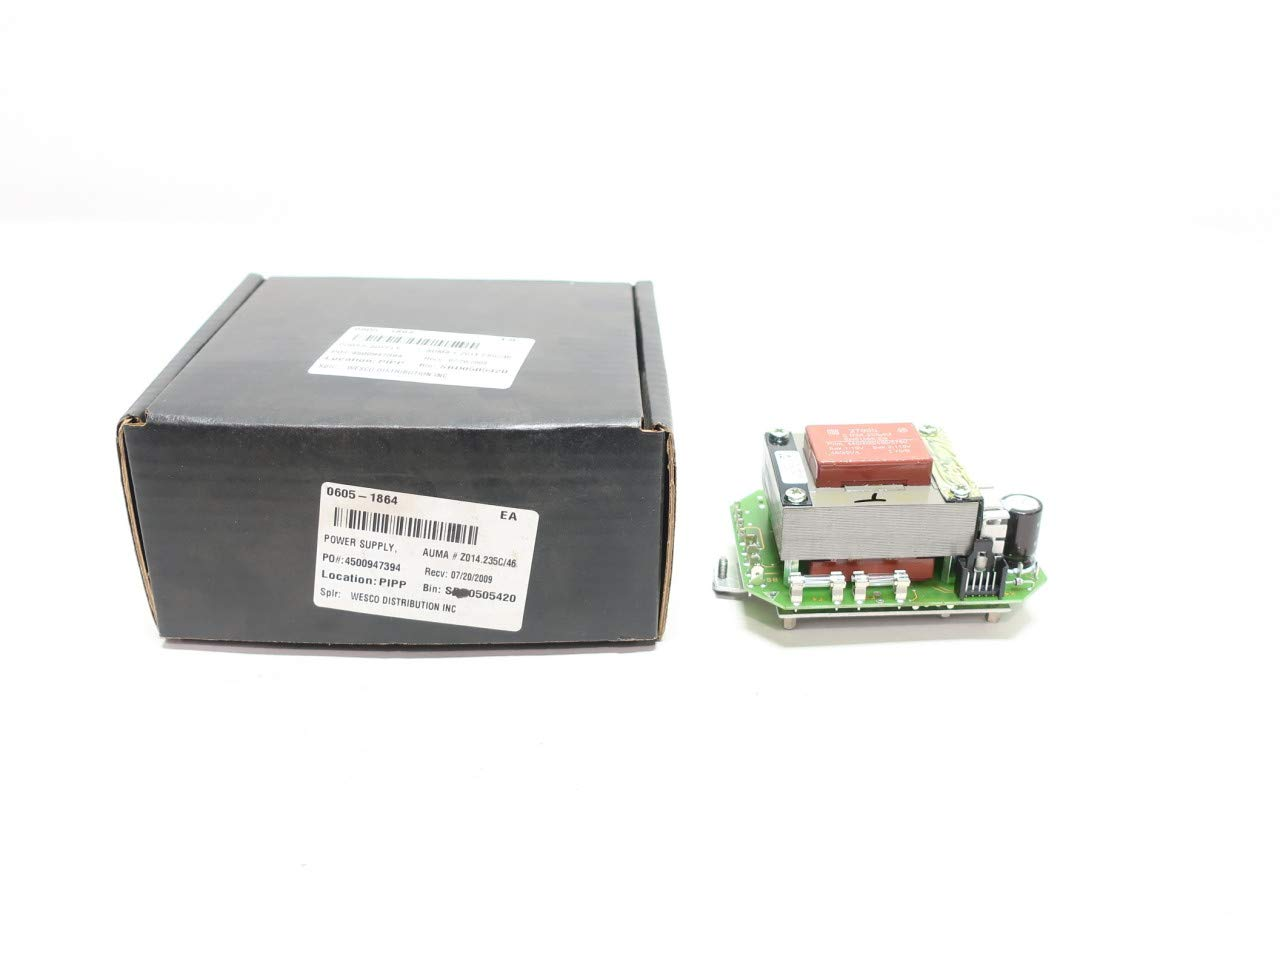 AUMA Z014.235C//46-00 Power Supply Module R690648